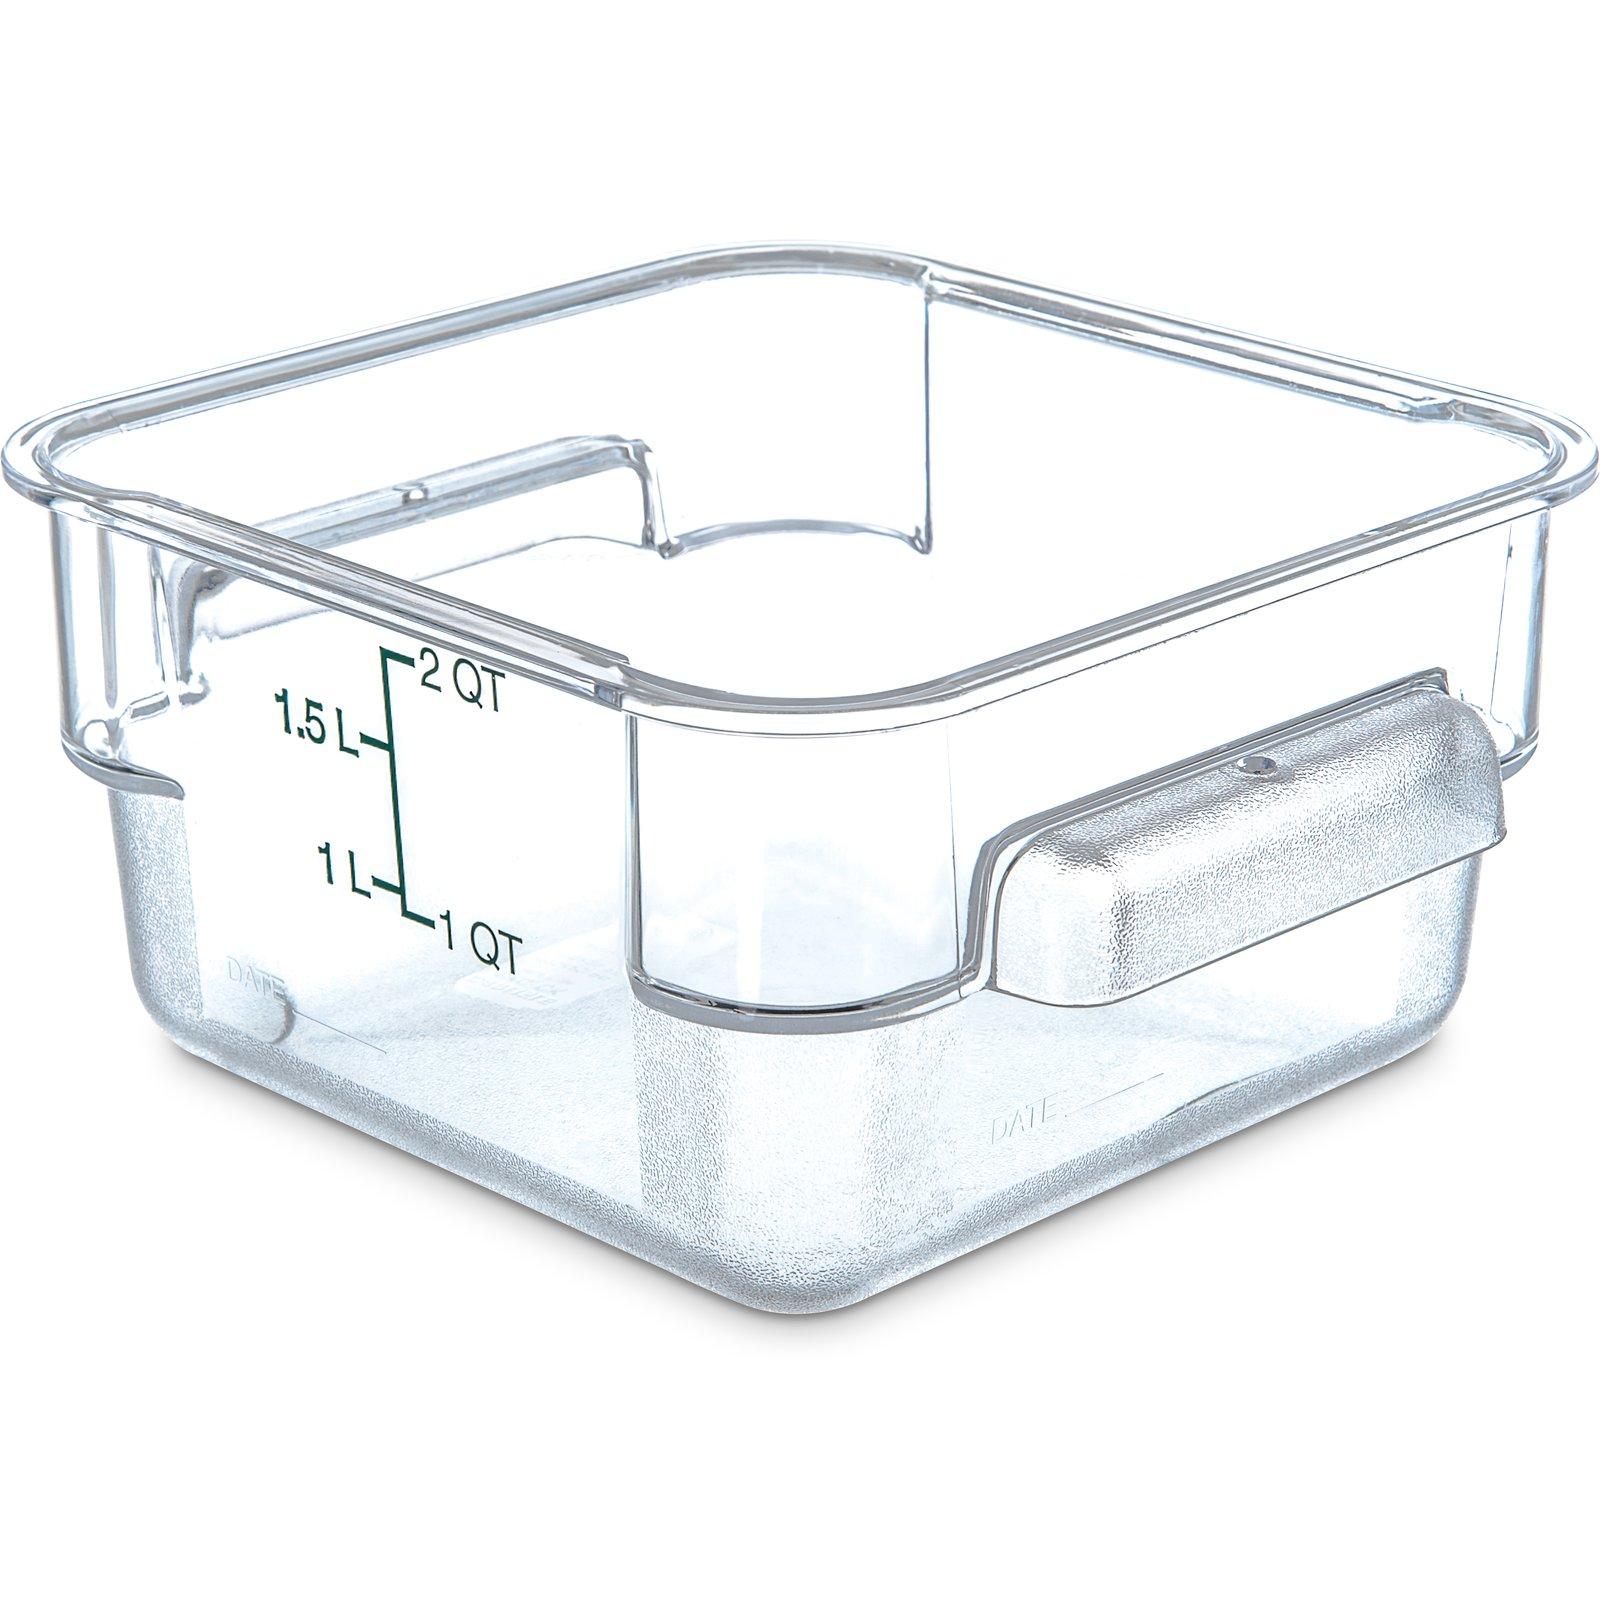 1072007 StorPlus Polycarbonate Square Food Storage Container 2 qt